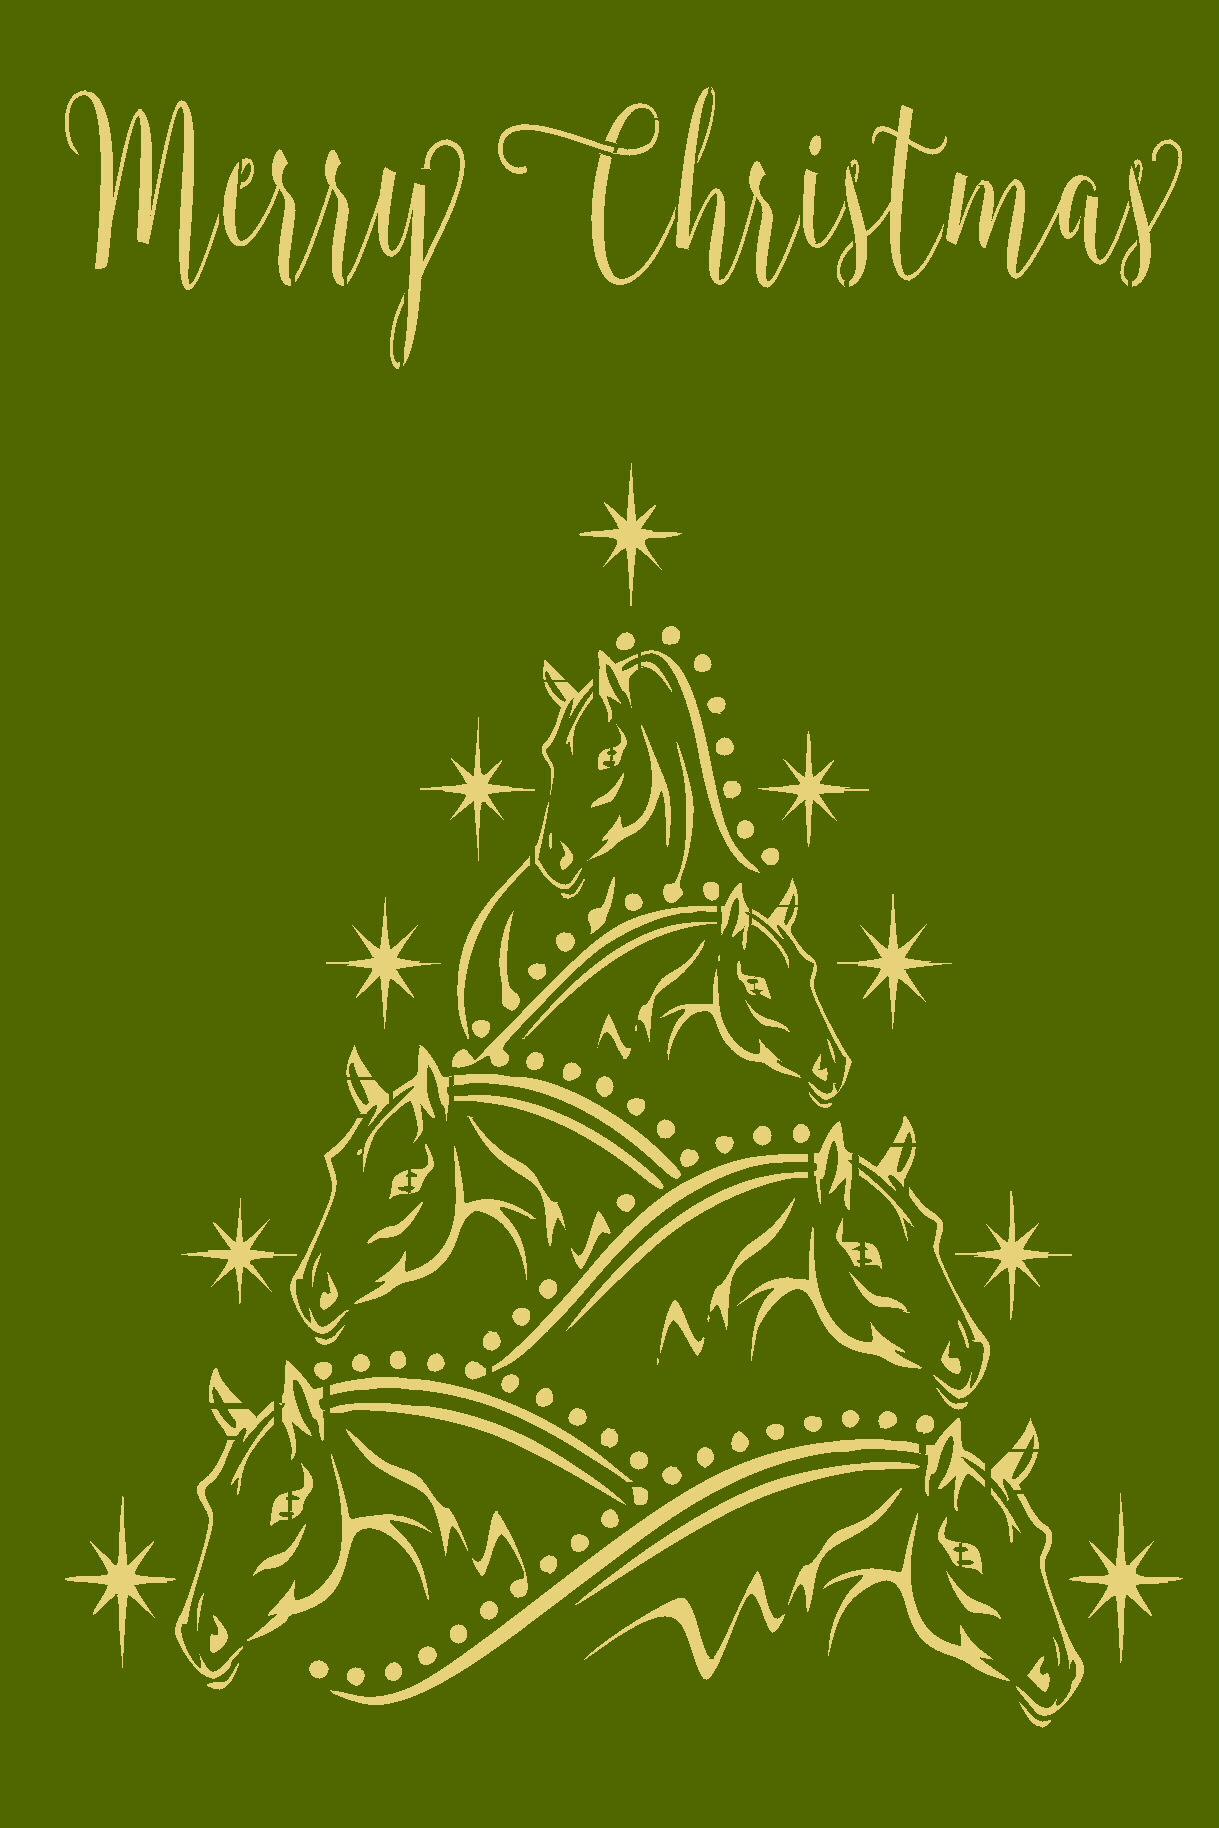 Merry Christmas Horse Tree Reusable Plastic Stencil Sign Stencils